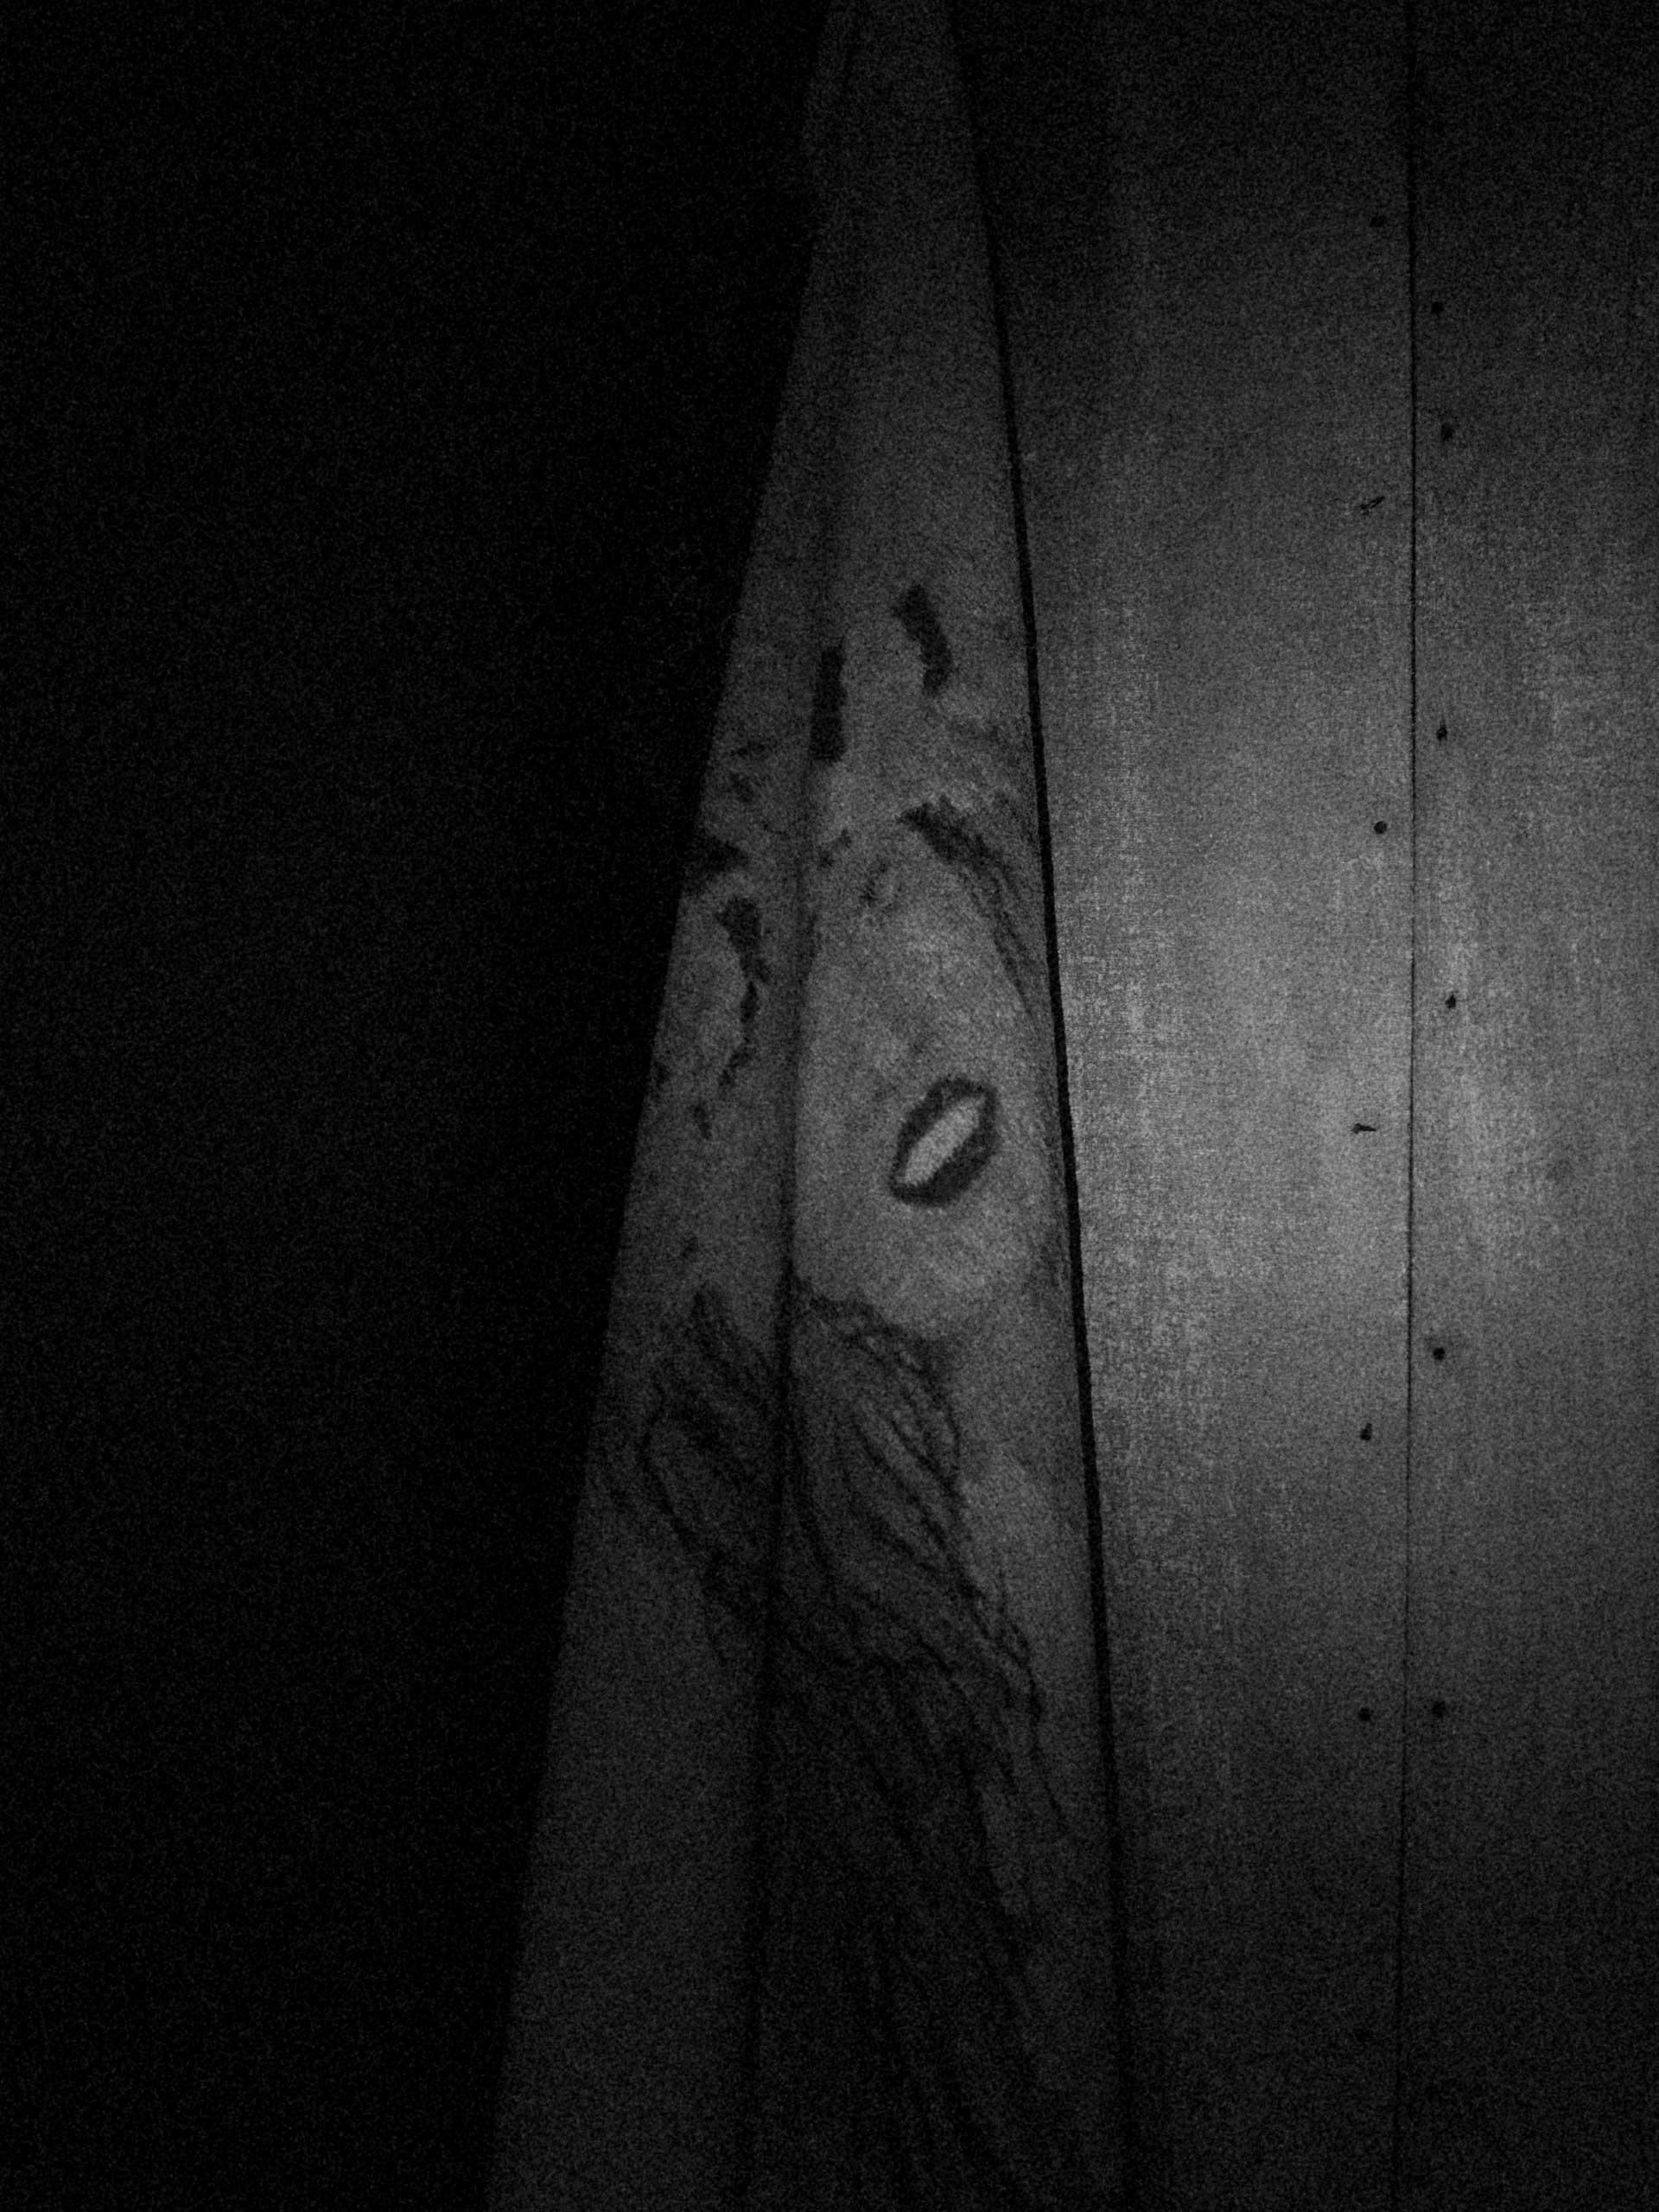 Image of a towel hangs in the Trudovski shelter. Trudovski, Donetsk Oblast, Ukraine. Oct. 18,  2014.